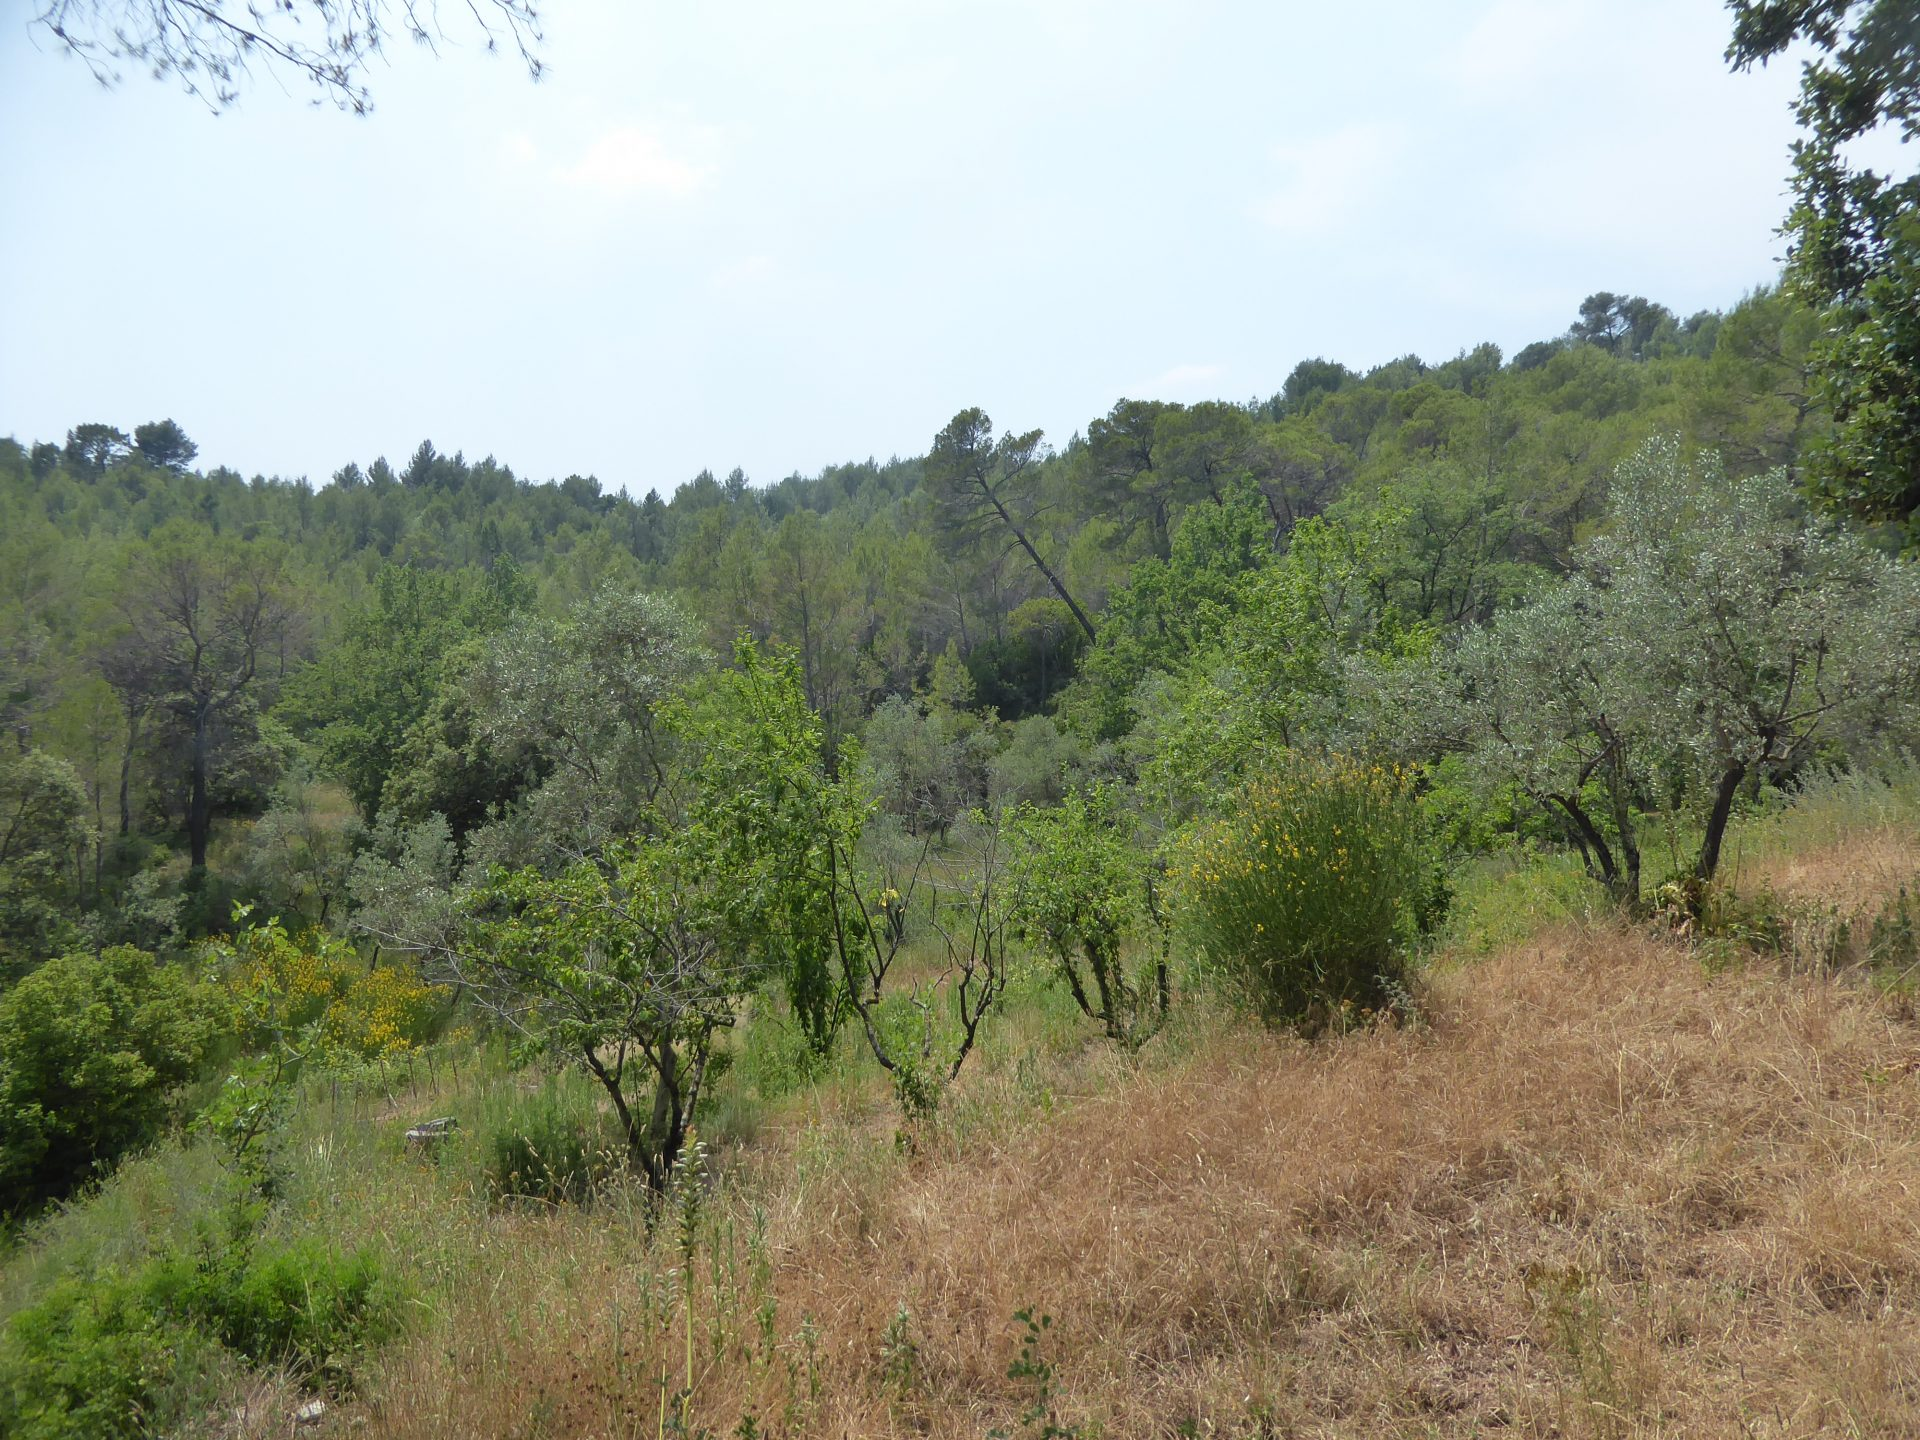 Countryside / undergrowth / moor